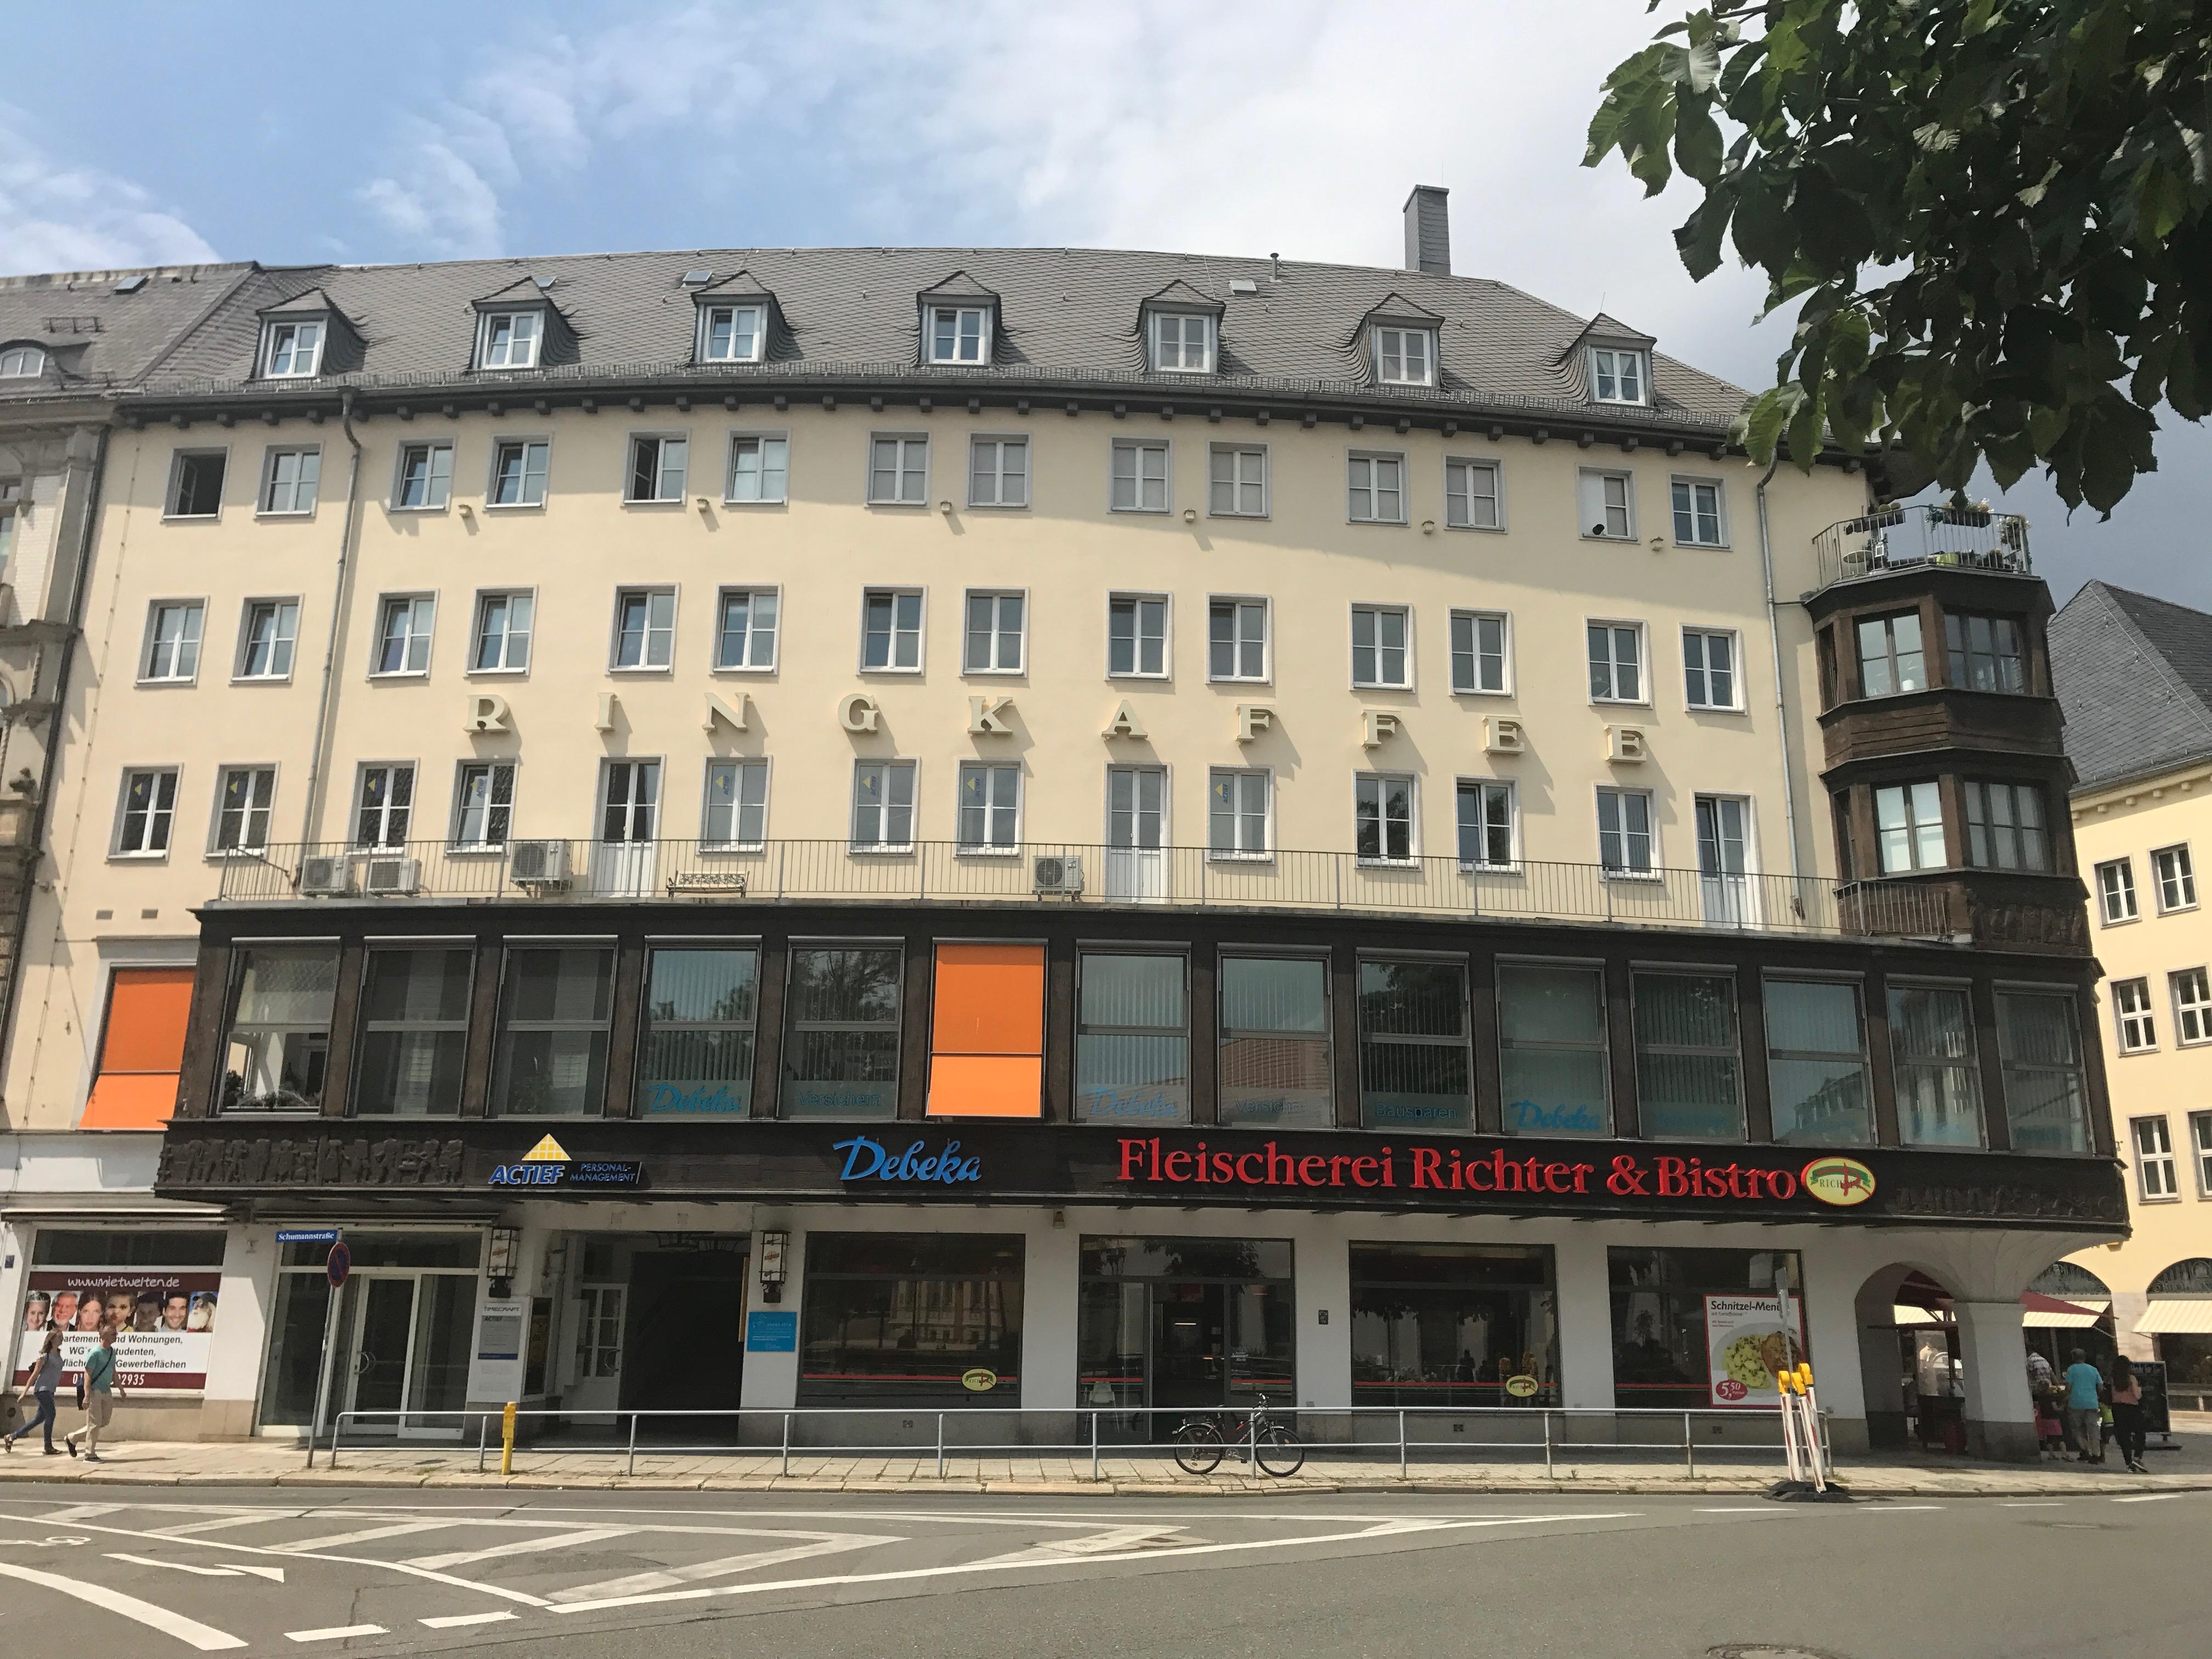 Actief Personalmanagement Zwickau